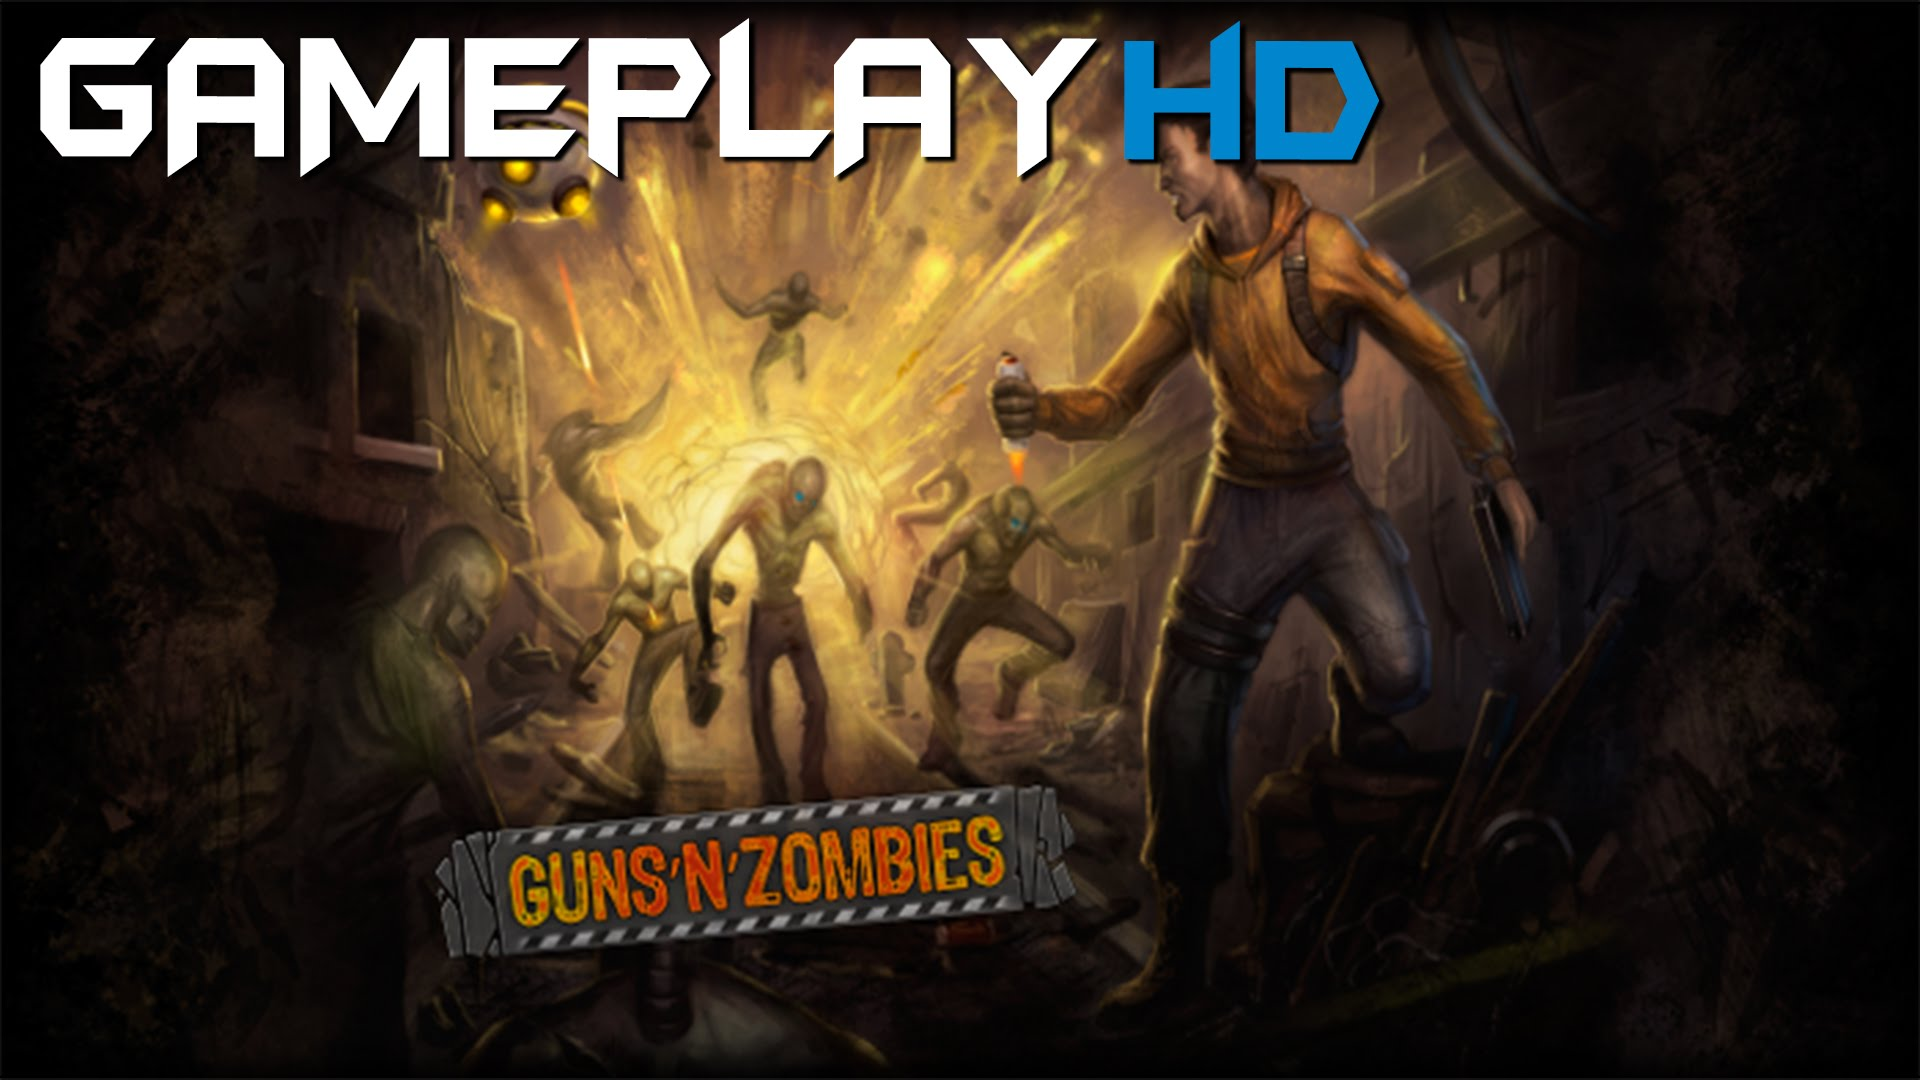 Guns'N'Zombies Backgrounds, Compatible - PC, Mobile, Gadgets  1920x1080 px